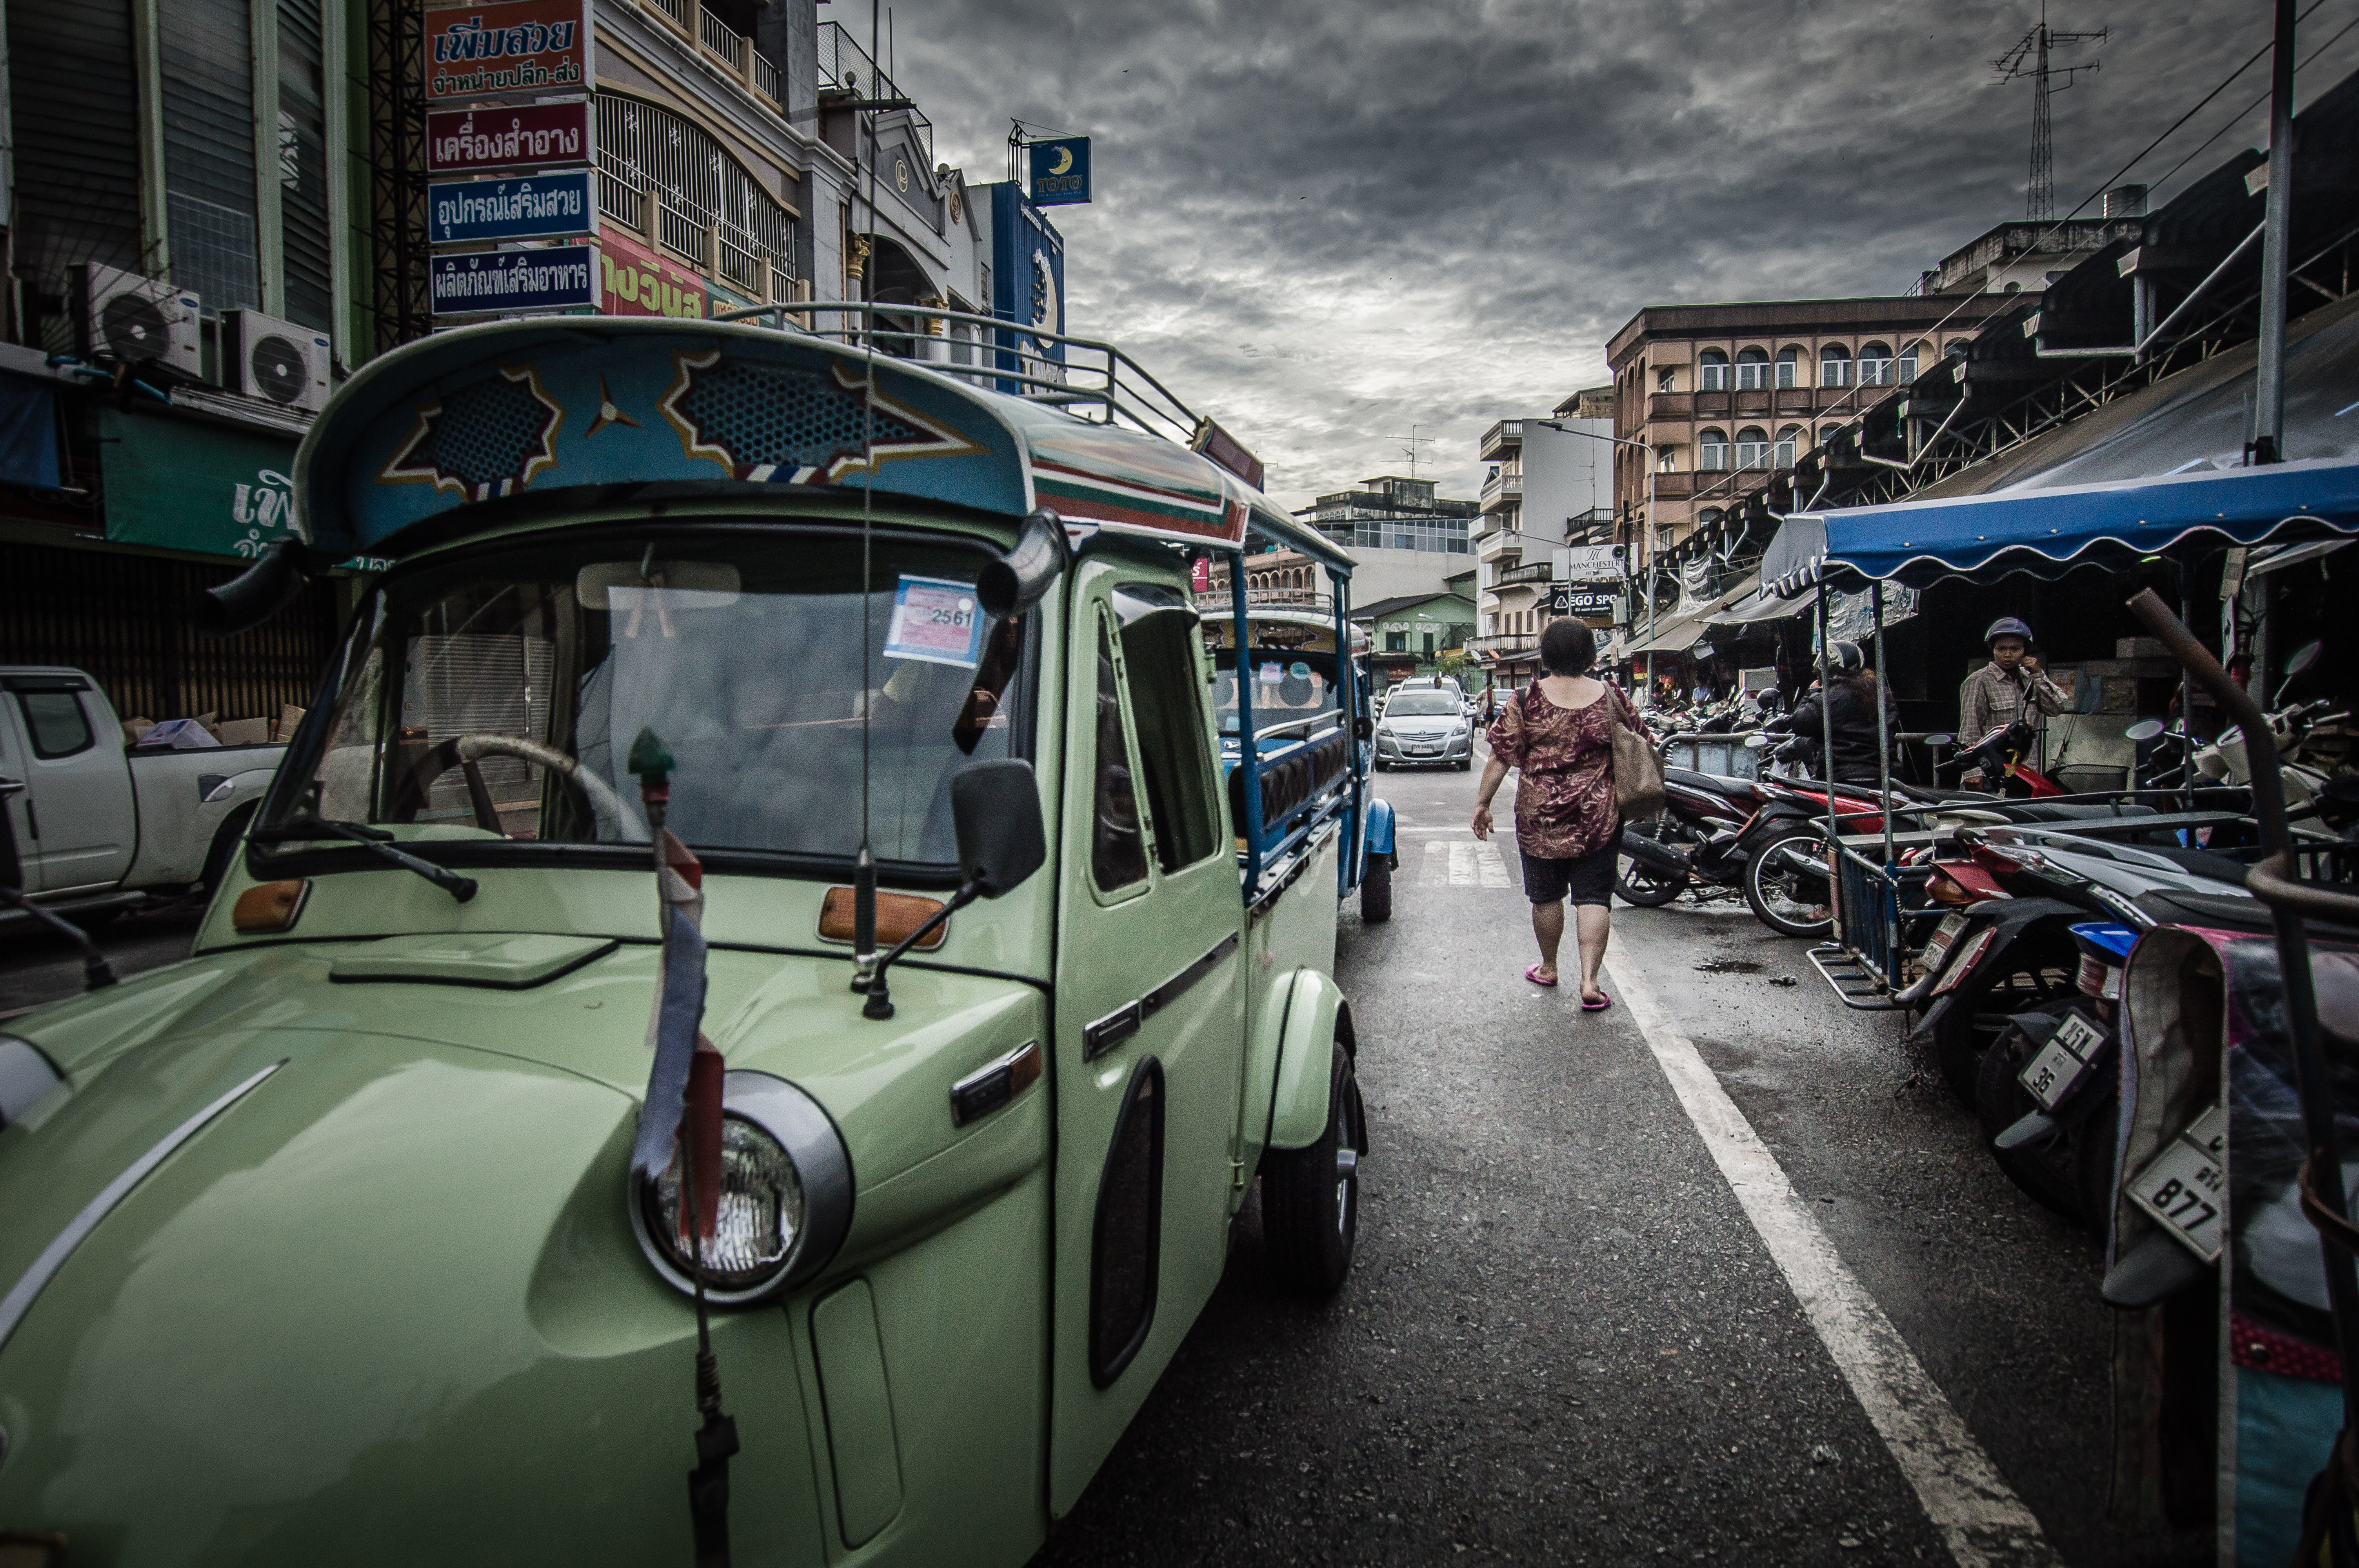 Woman walking on the street photo